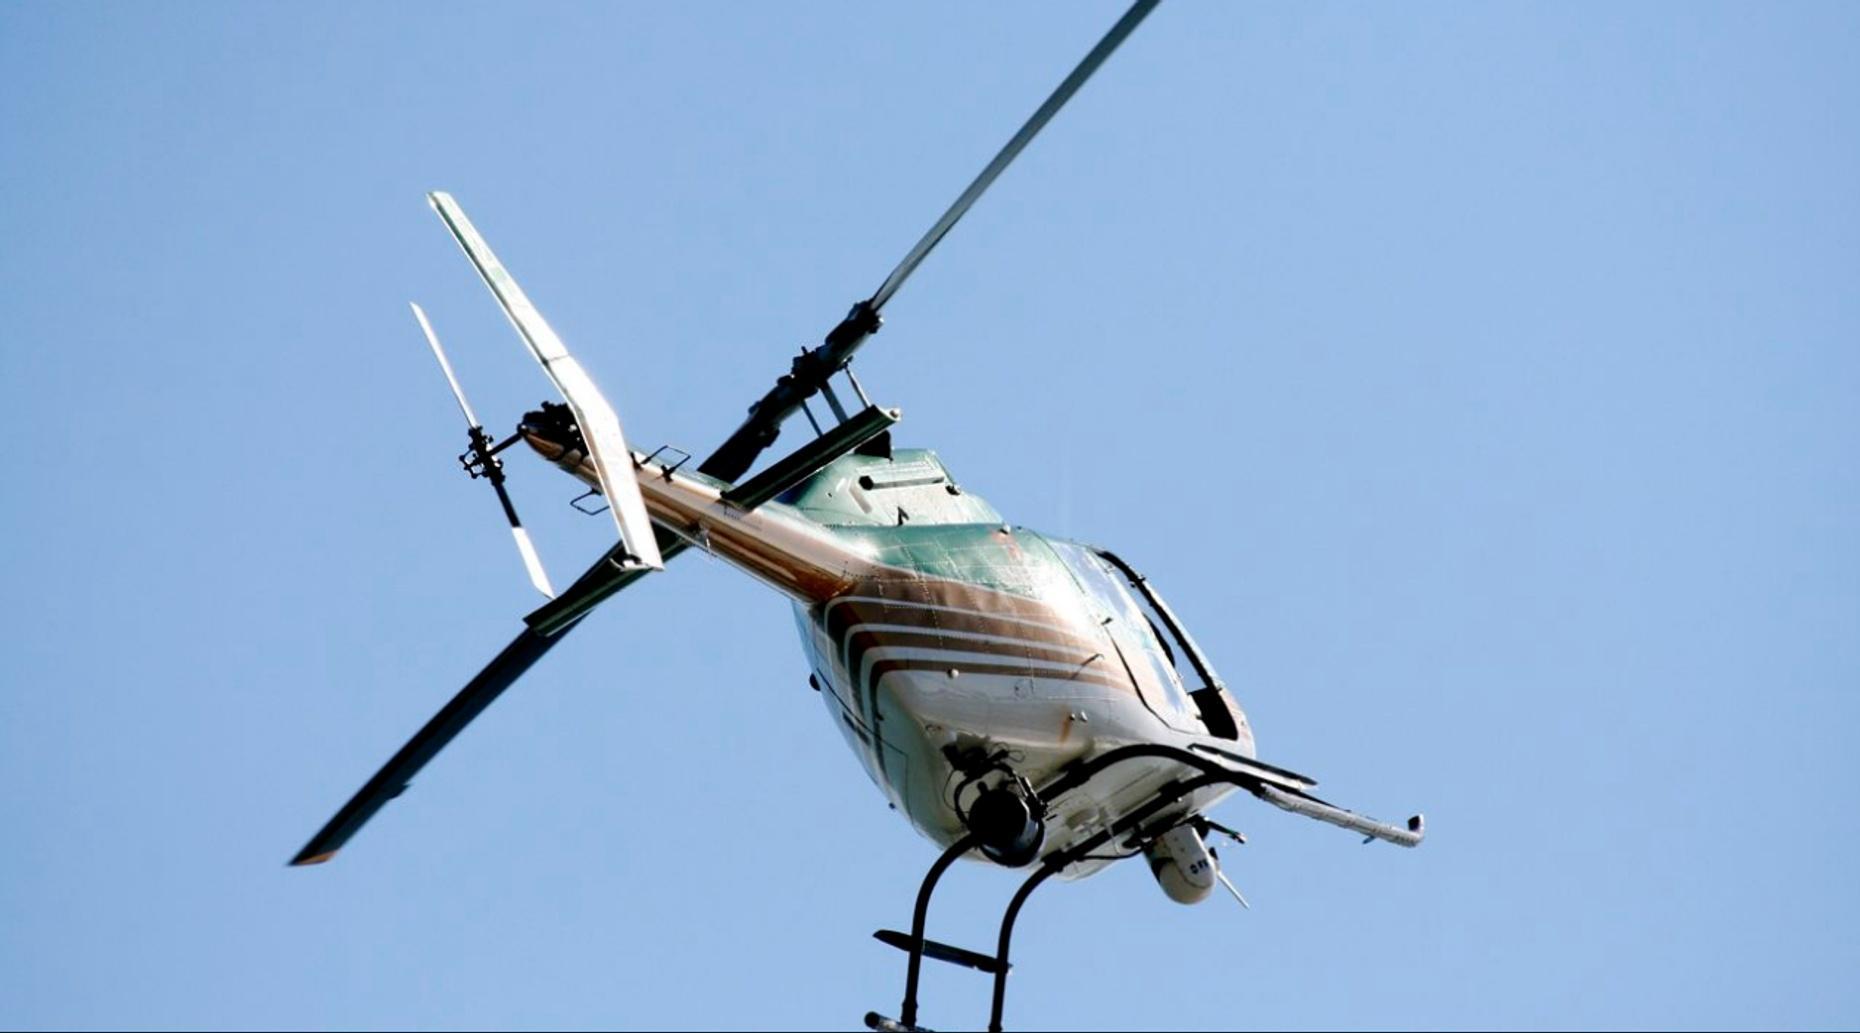 Buckhead Helicopter Tour